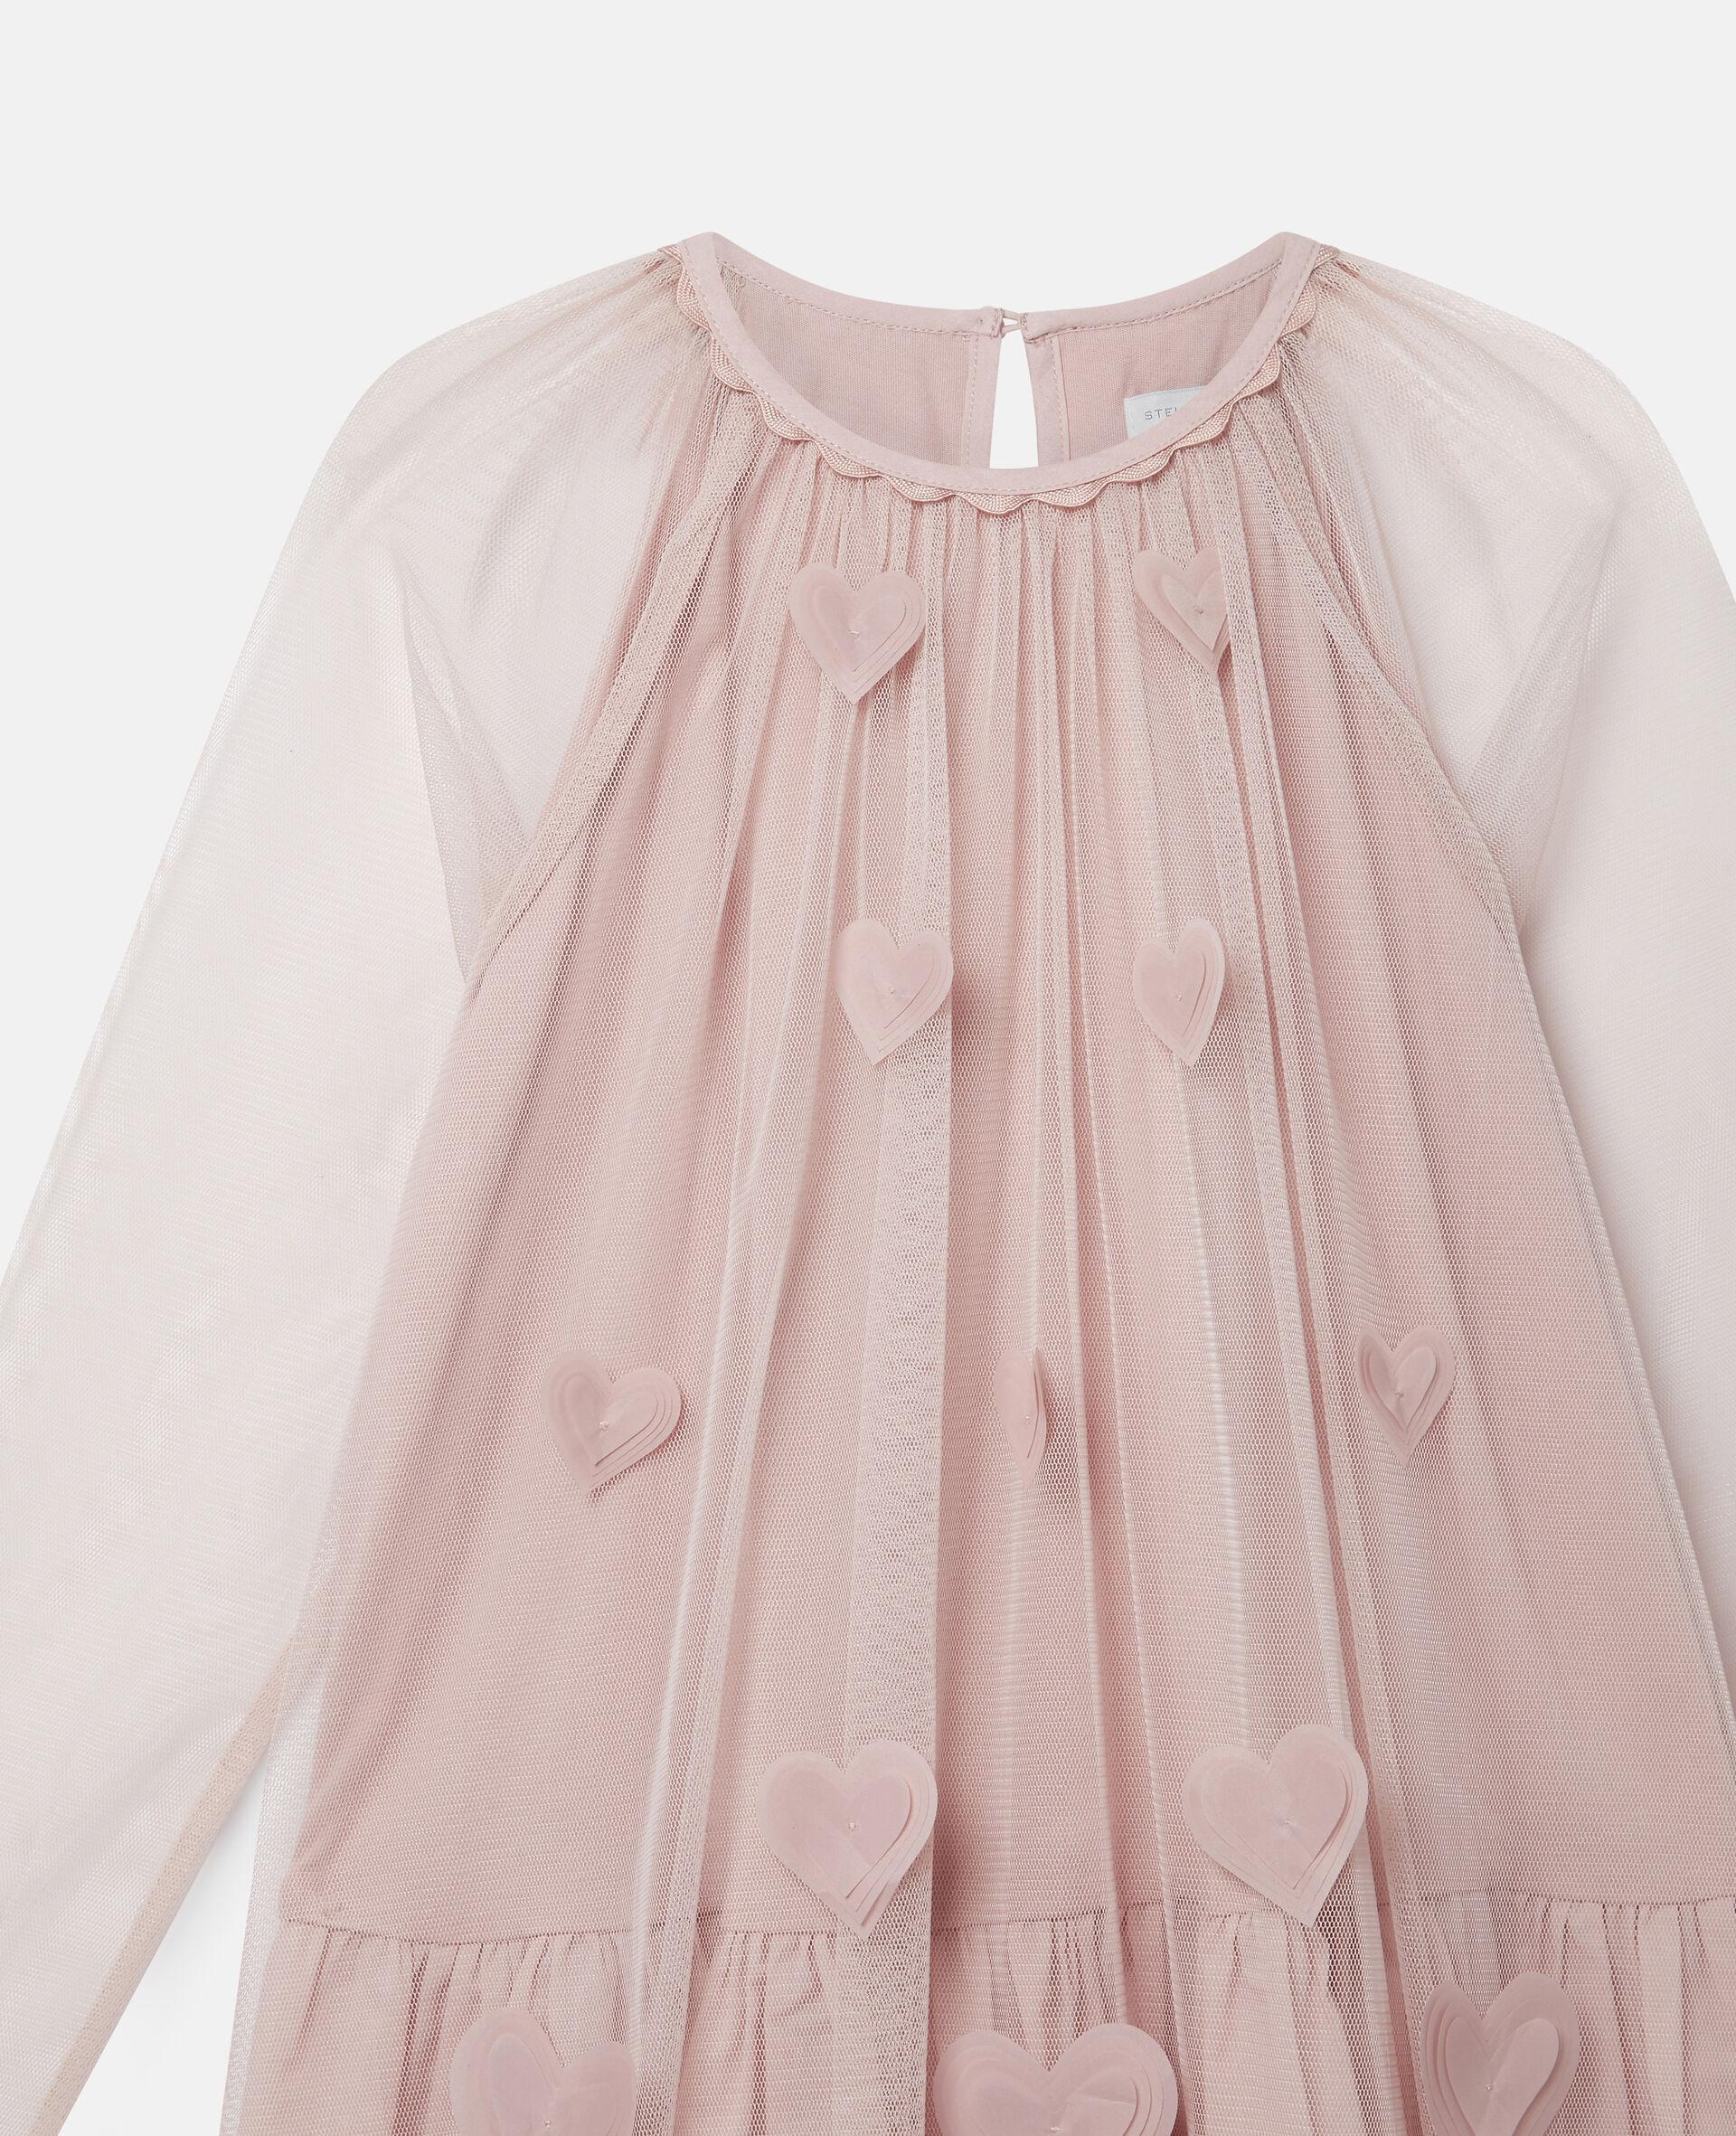 3D Hearts Tulle Dress-Pink-large image number 2